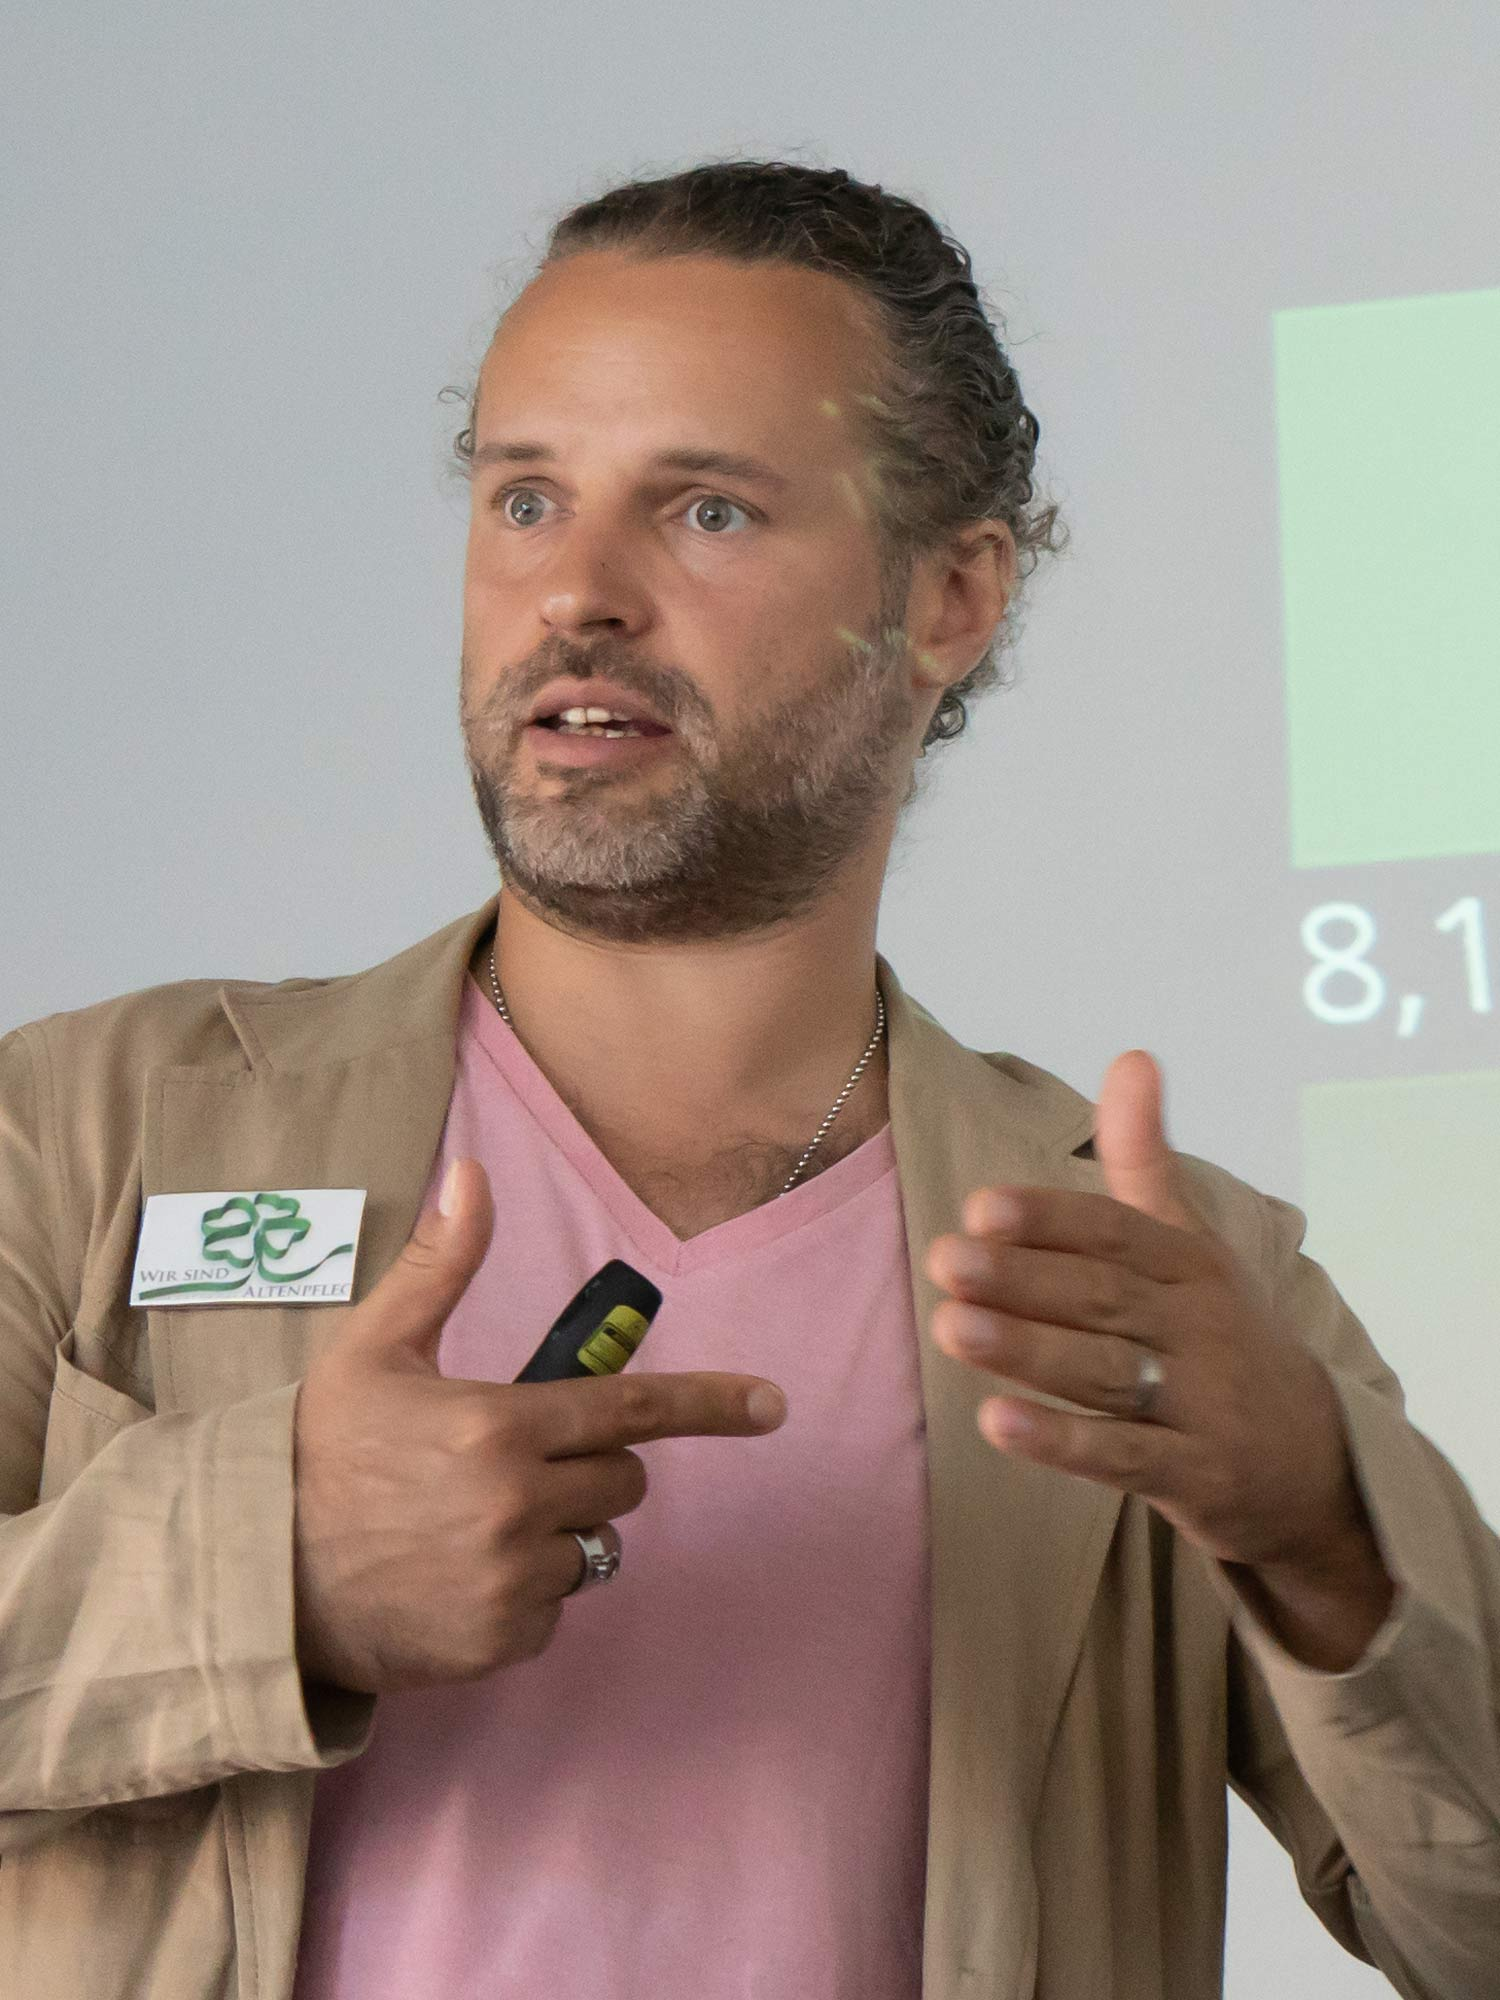 Armando Sommer